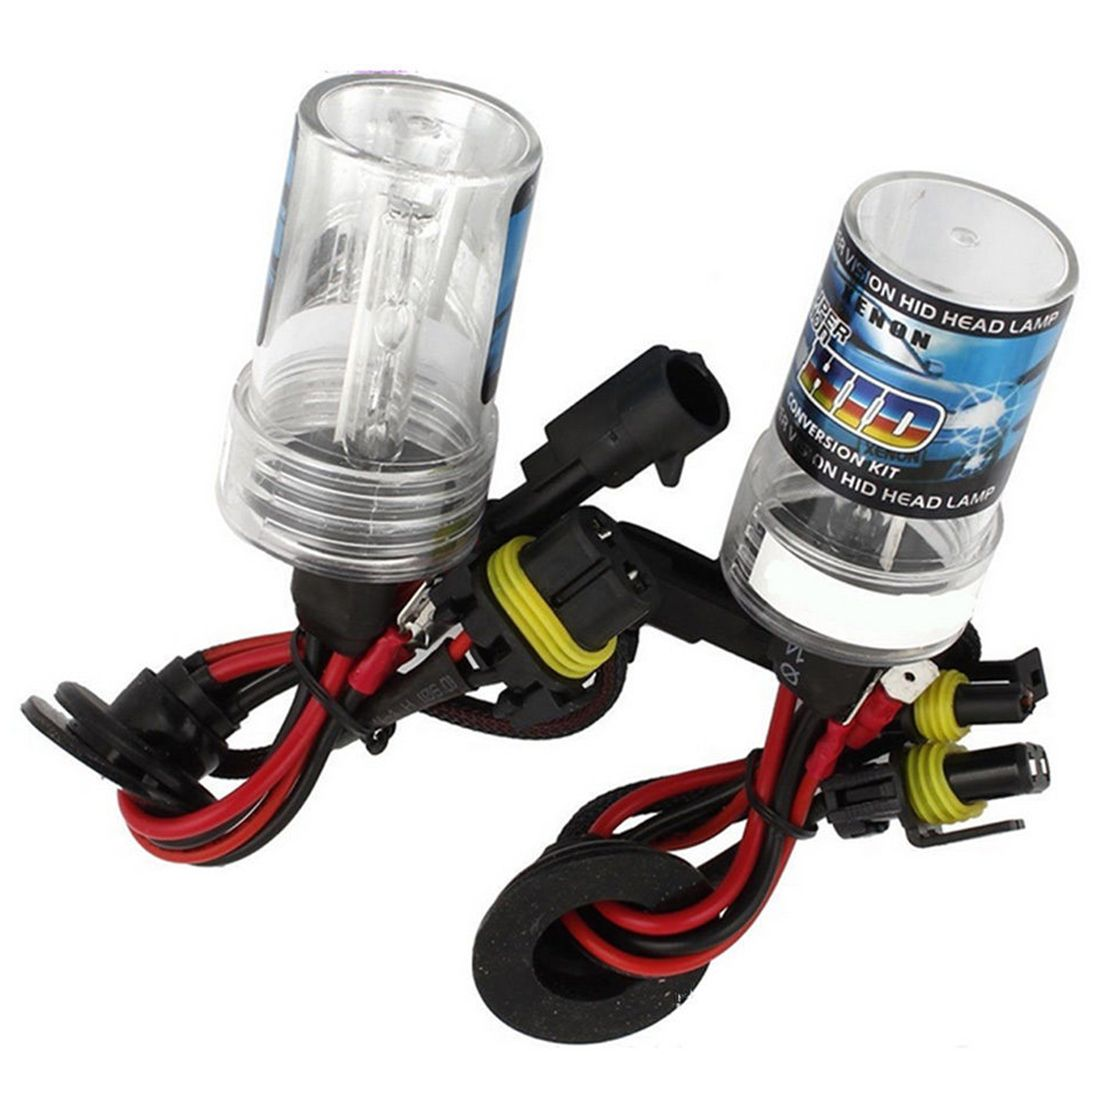 H7 HID Conversion Kit All Colors Xenon Headlight Light Bulbs Slim Ballast 55W